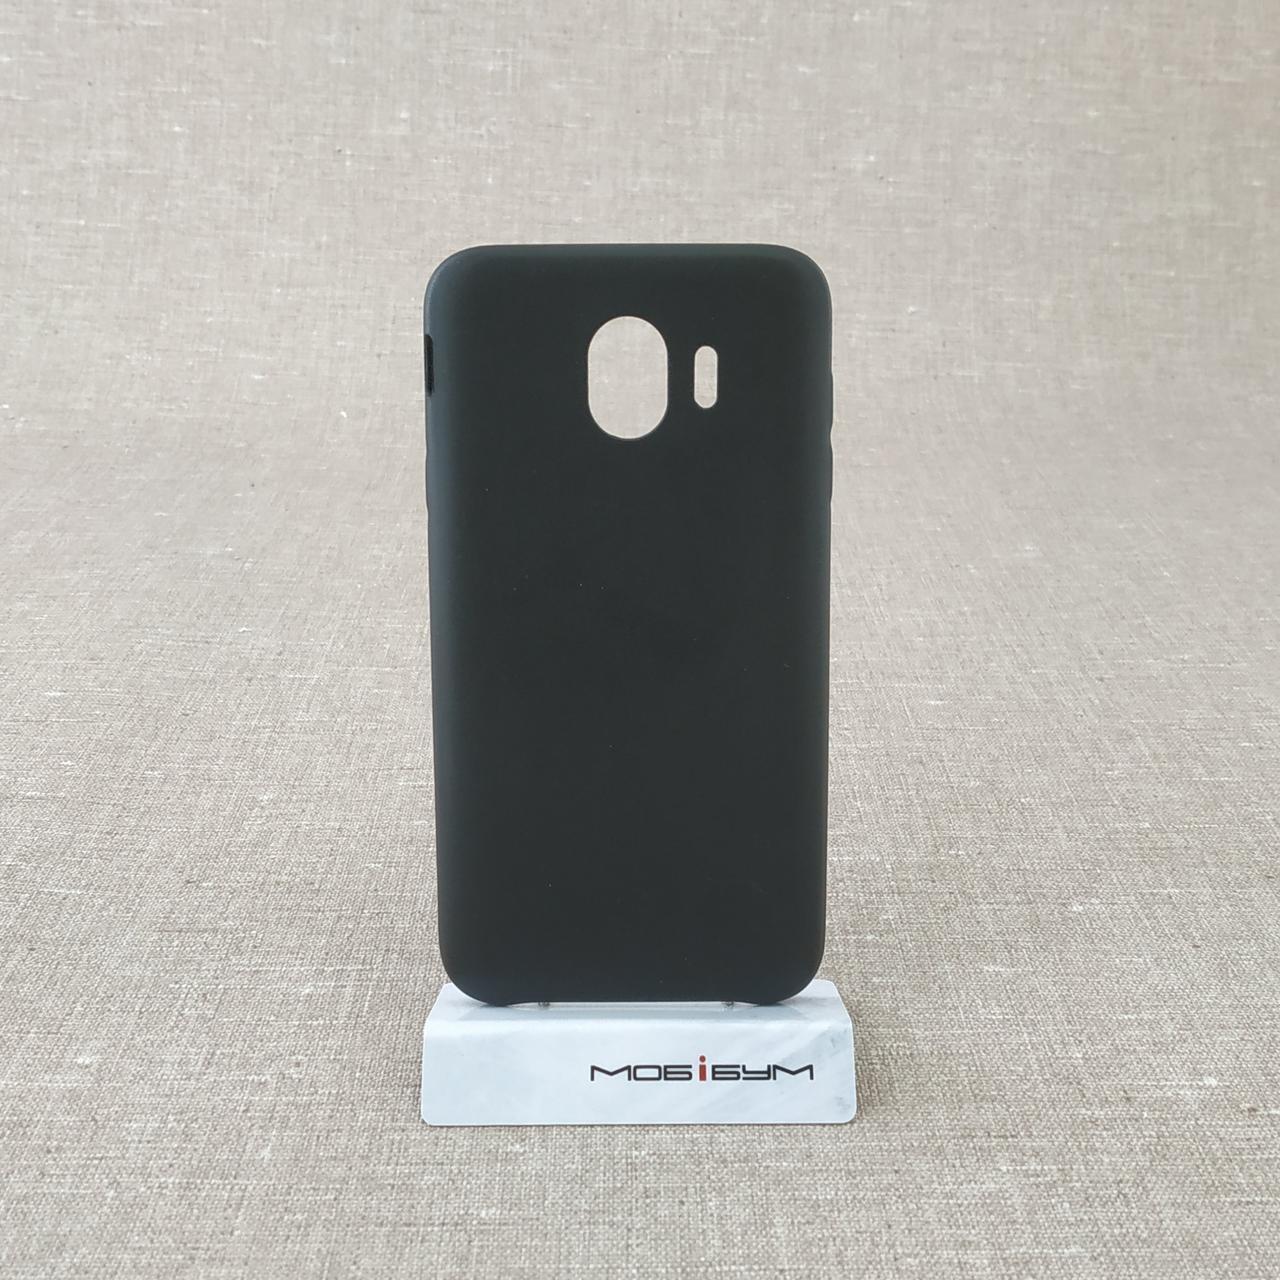 Чехол 2E PU Samsung Galaxy J4 J400 black (2E-G-J4-MCPUB) EAN/UPC: 680051626987